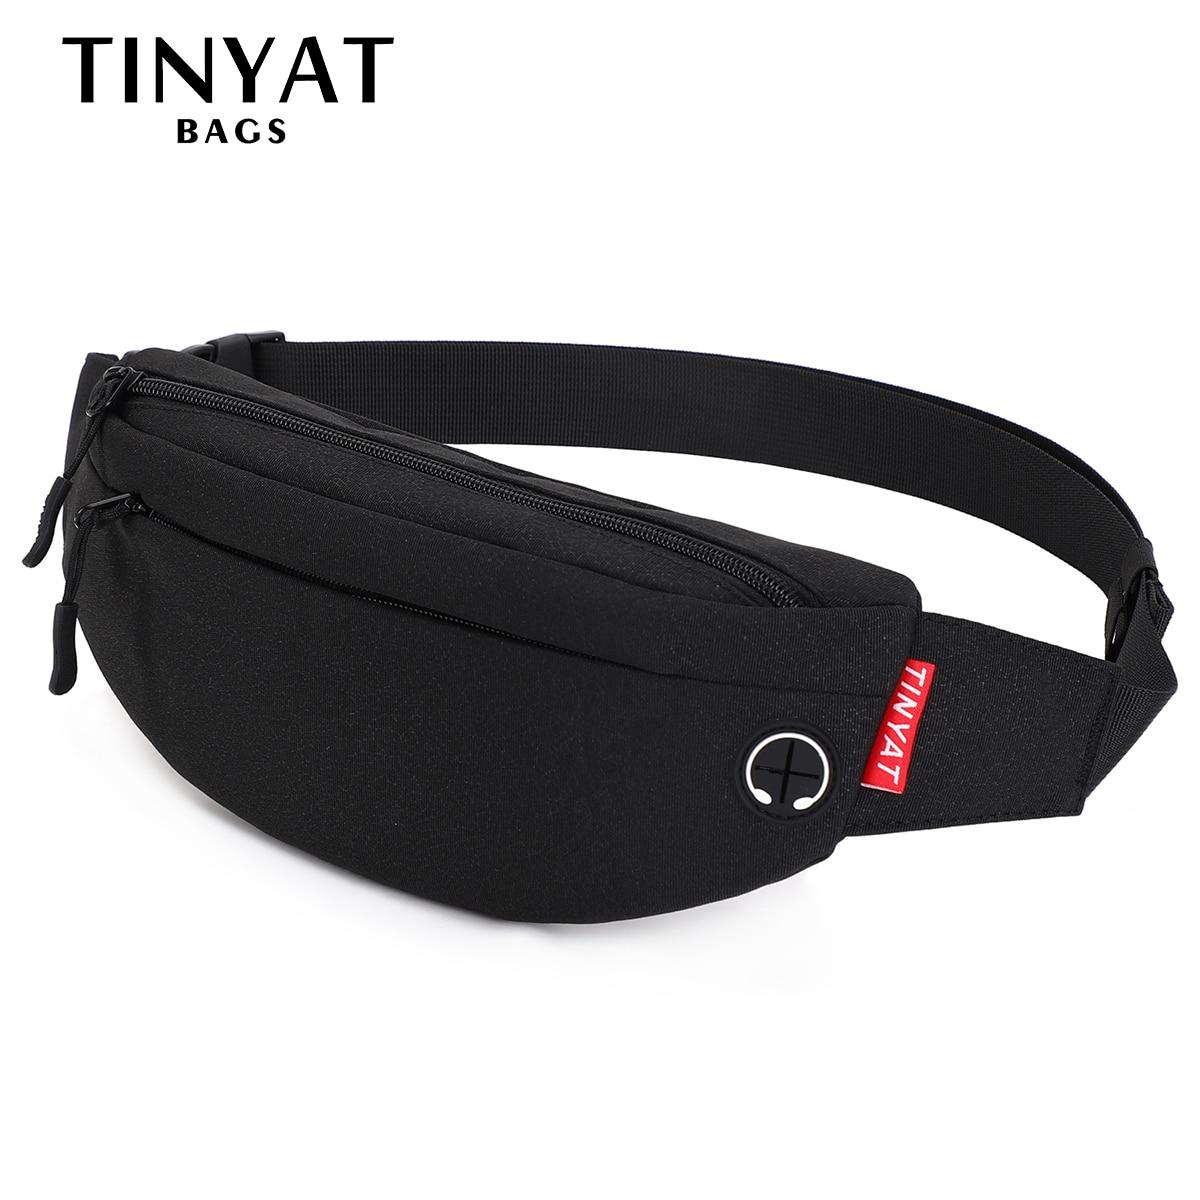 TINYAT Men Waist Bag Pack Purse Casual Large Phone Belt Bag Pouch Women's Canvas Travel Phone Bag Fanny Banana Bag Hip 4 Pockets